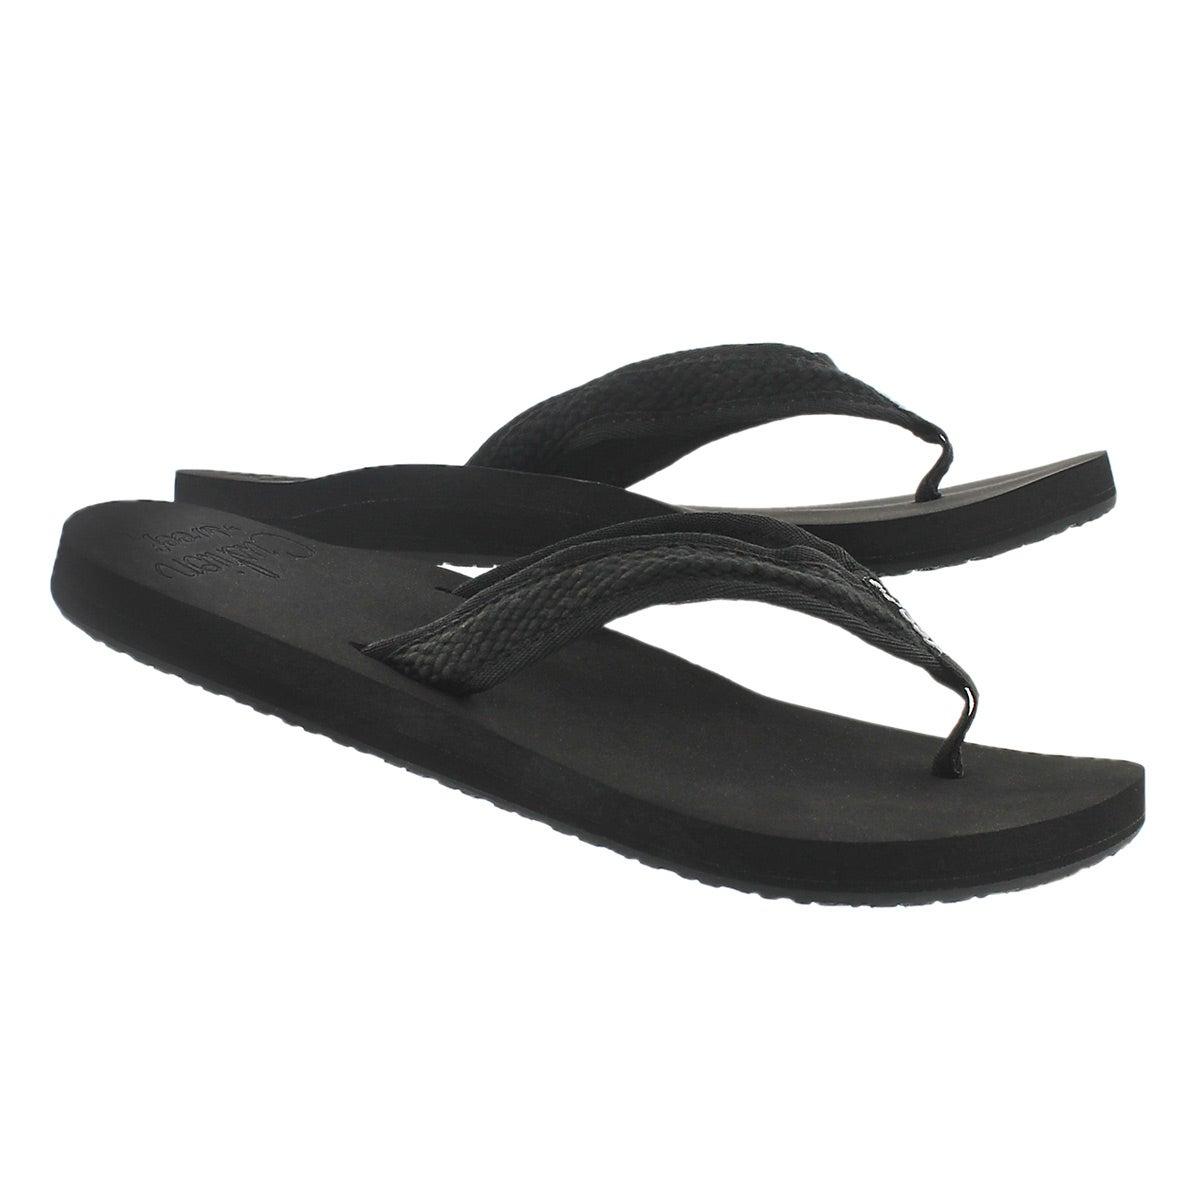 Lds Braided Cushion black thong sandal